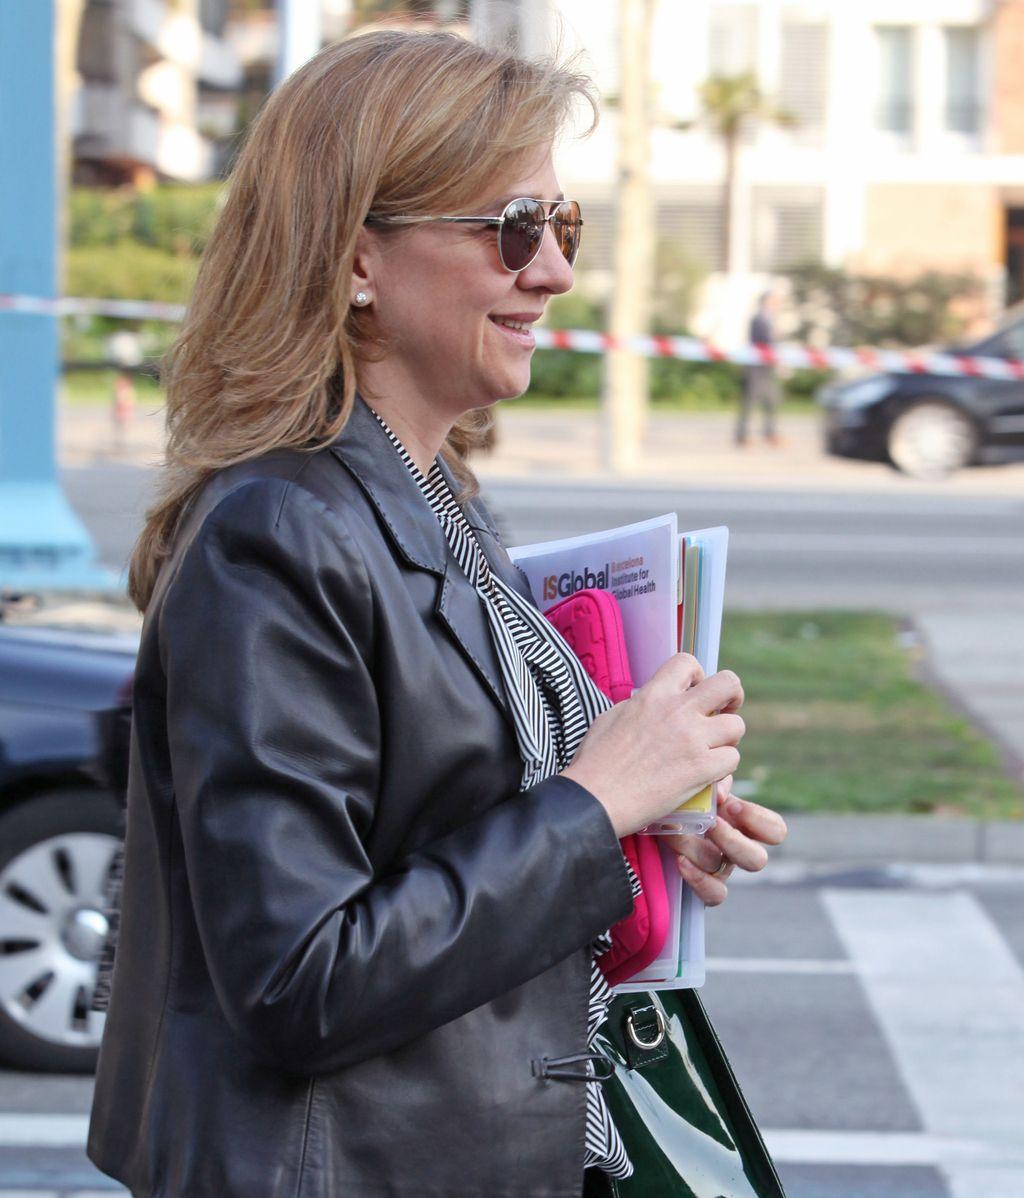 La Infanta ya no está tan enamorada de Iñaki, según Consuelo Font